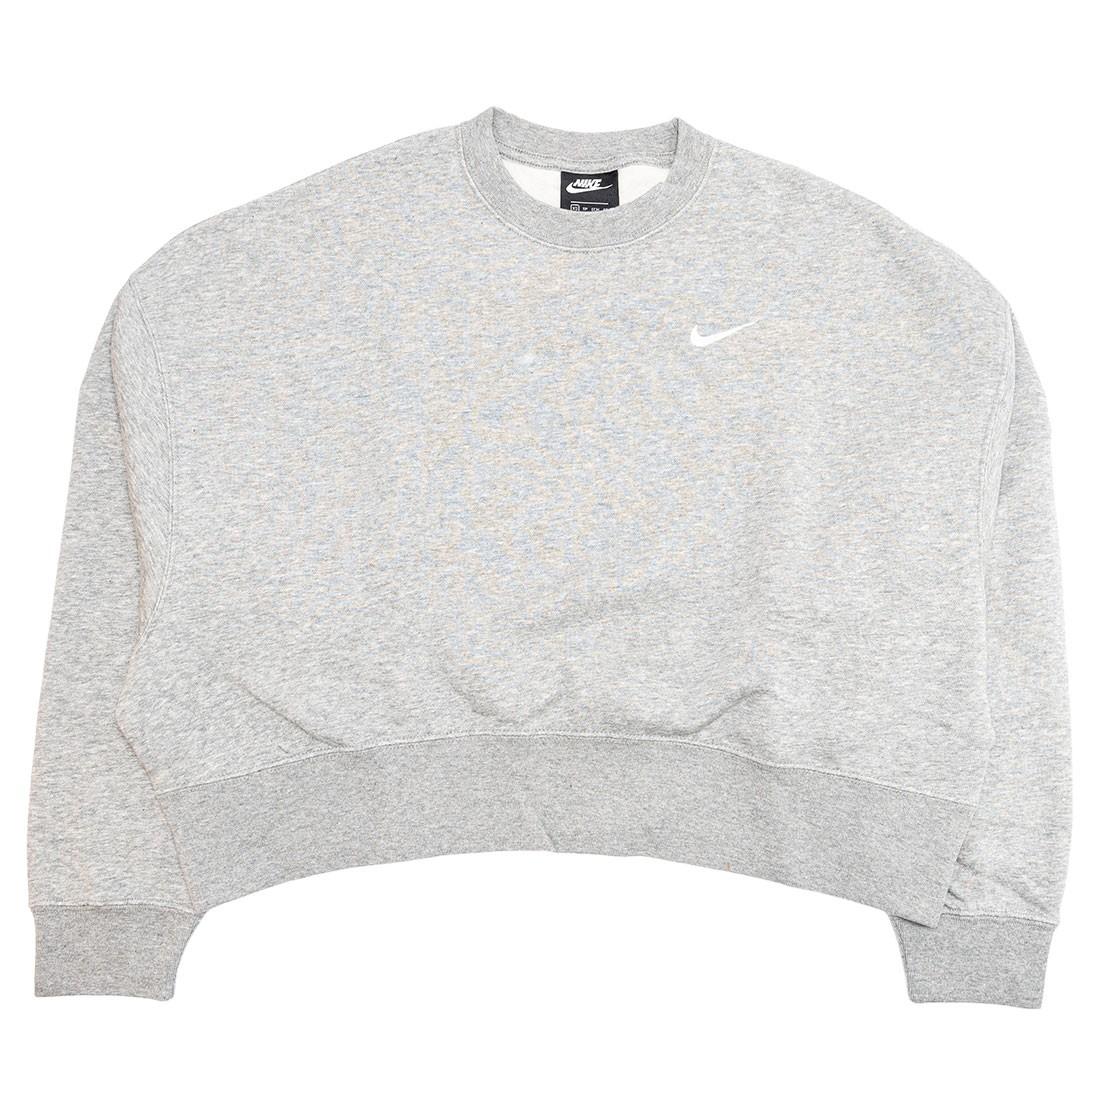 Nike Women Sportswear Essential Crewneck (dk grey heather / white)